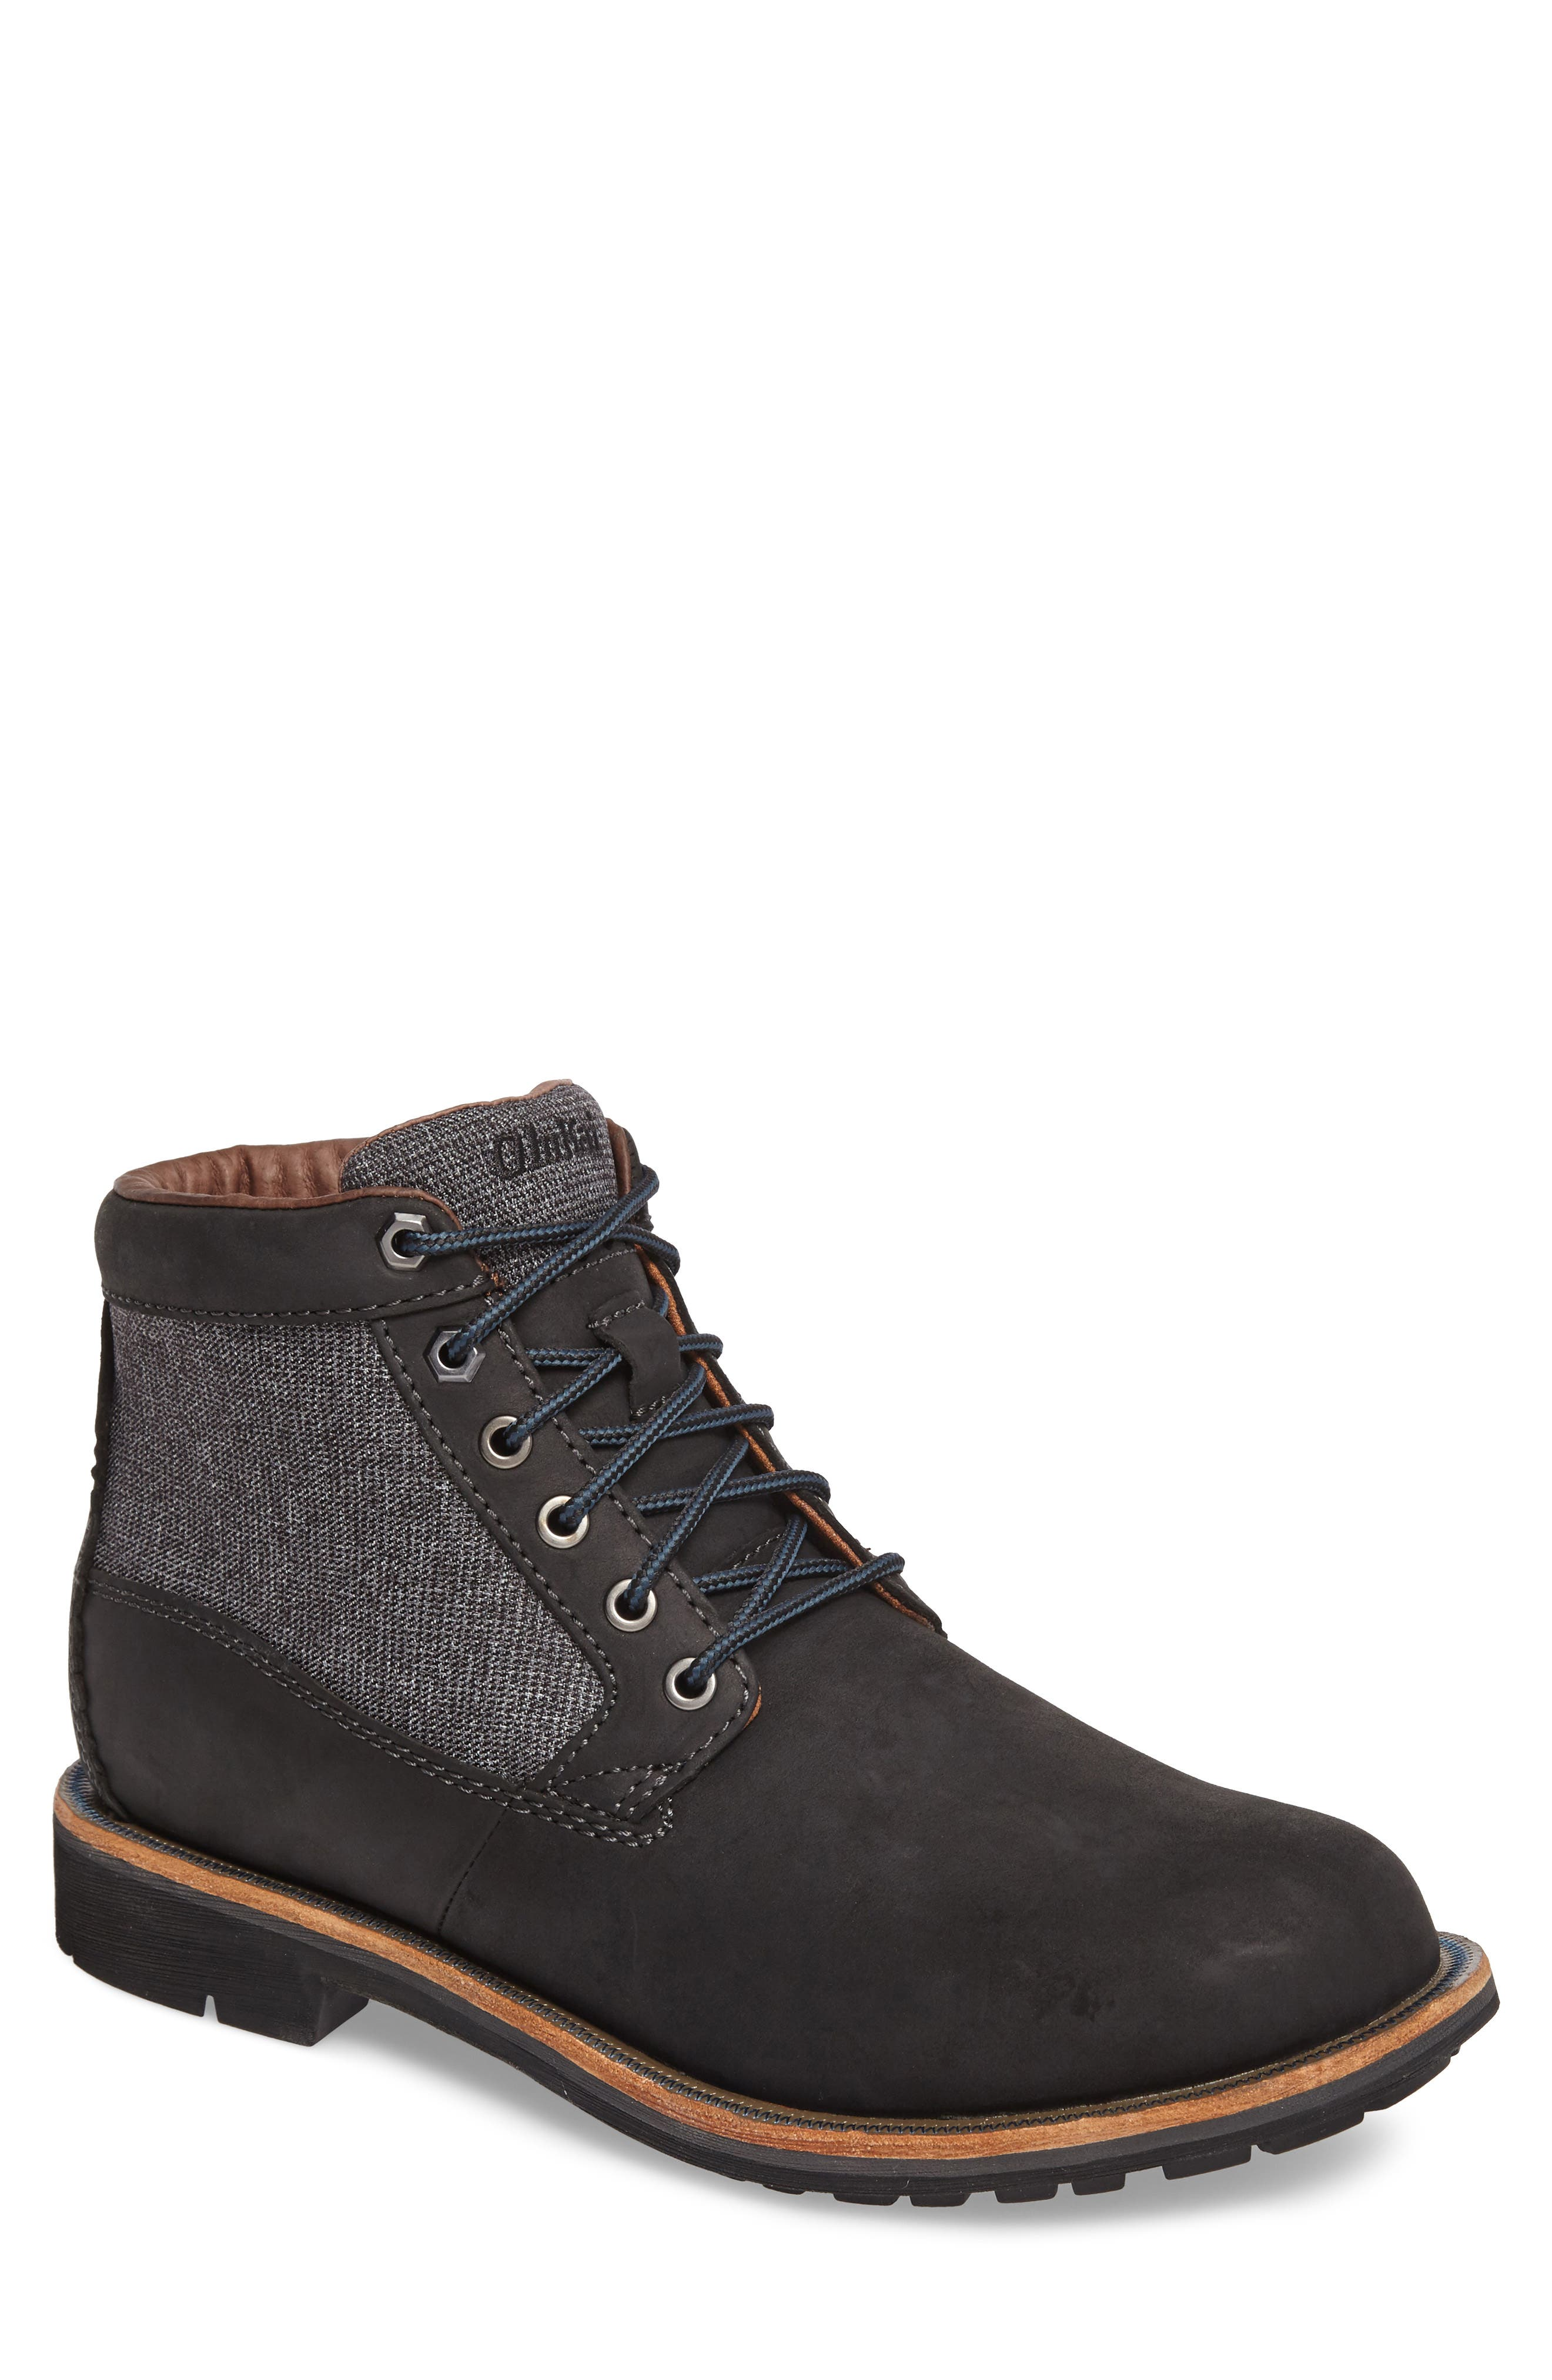 Hualalai Plain Toe Boot,                         Main,                         color, 001